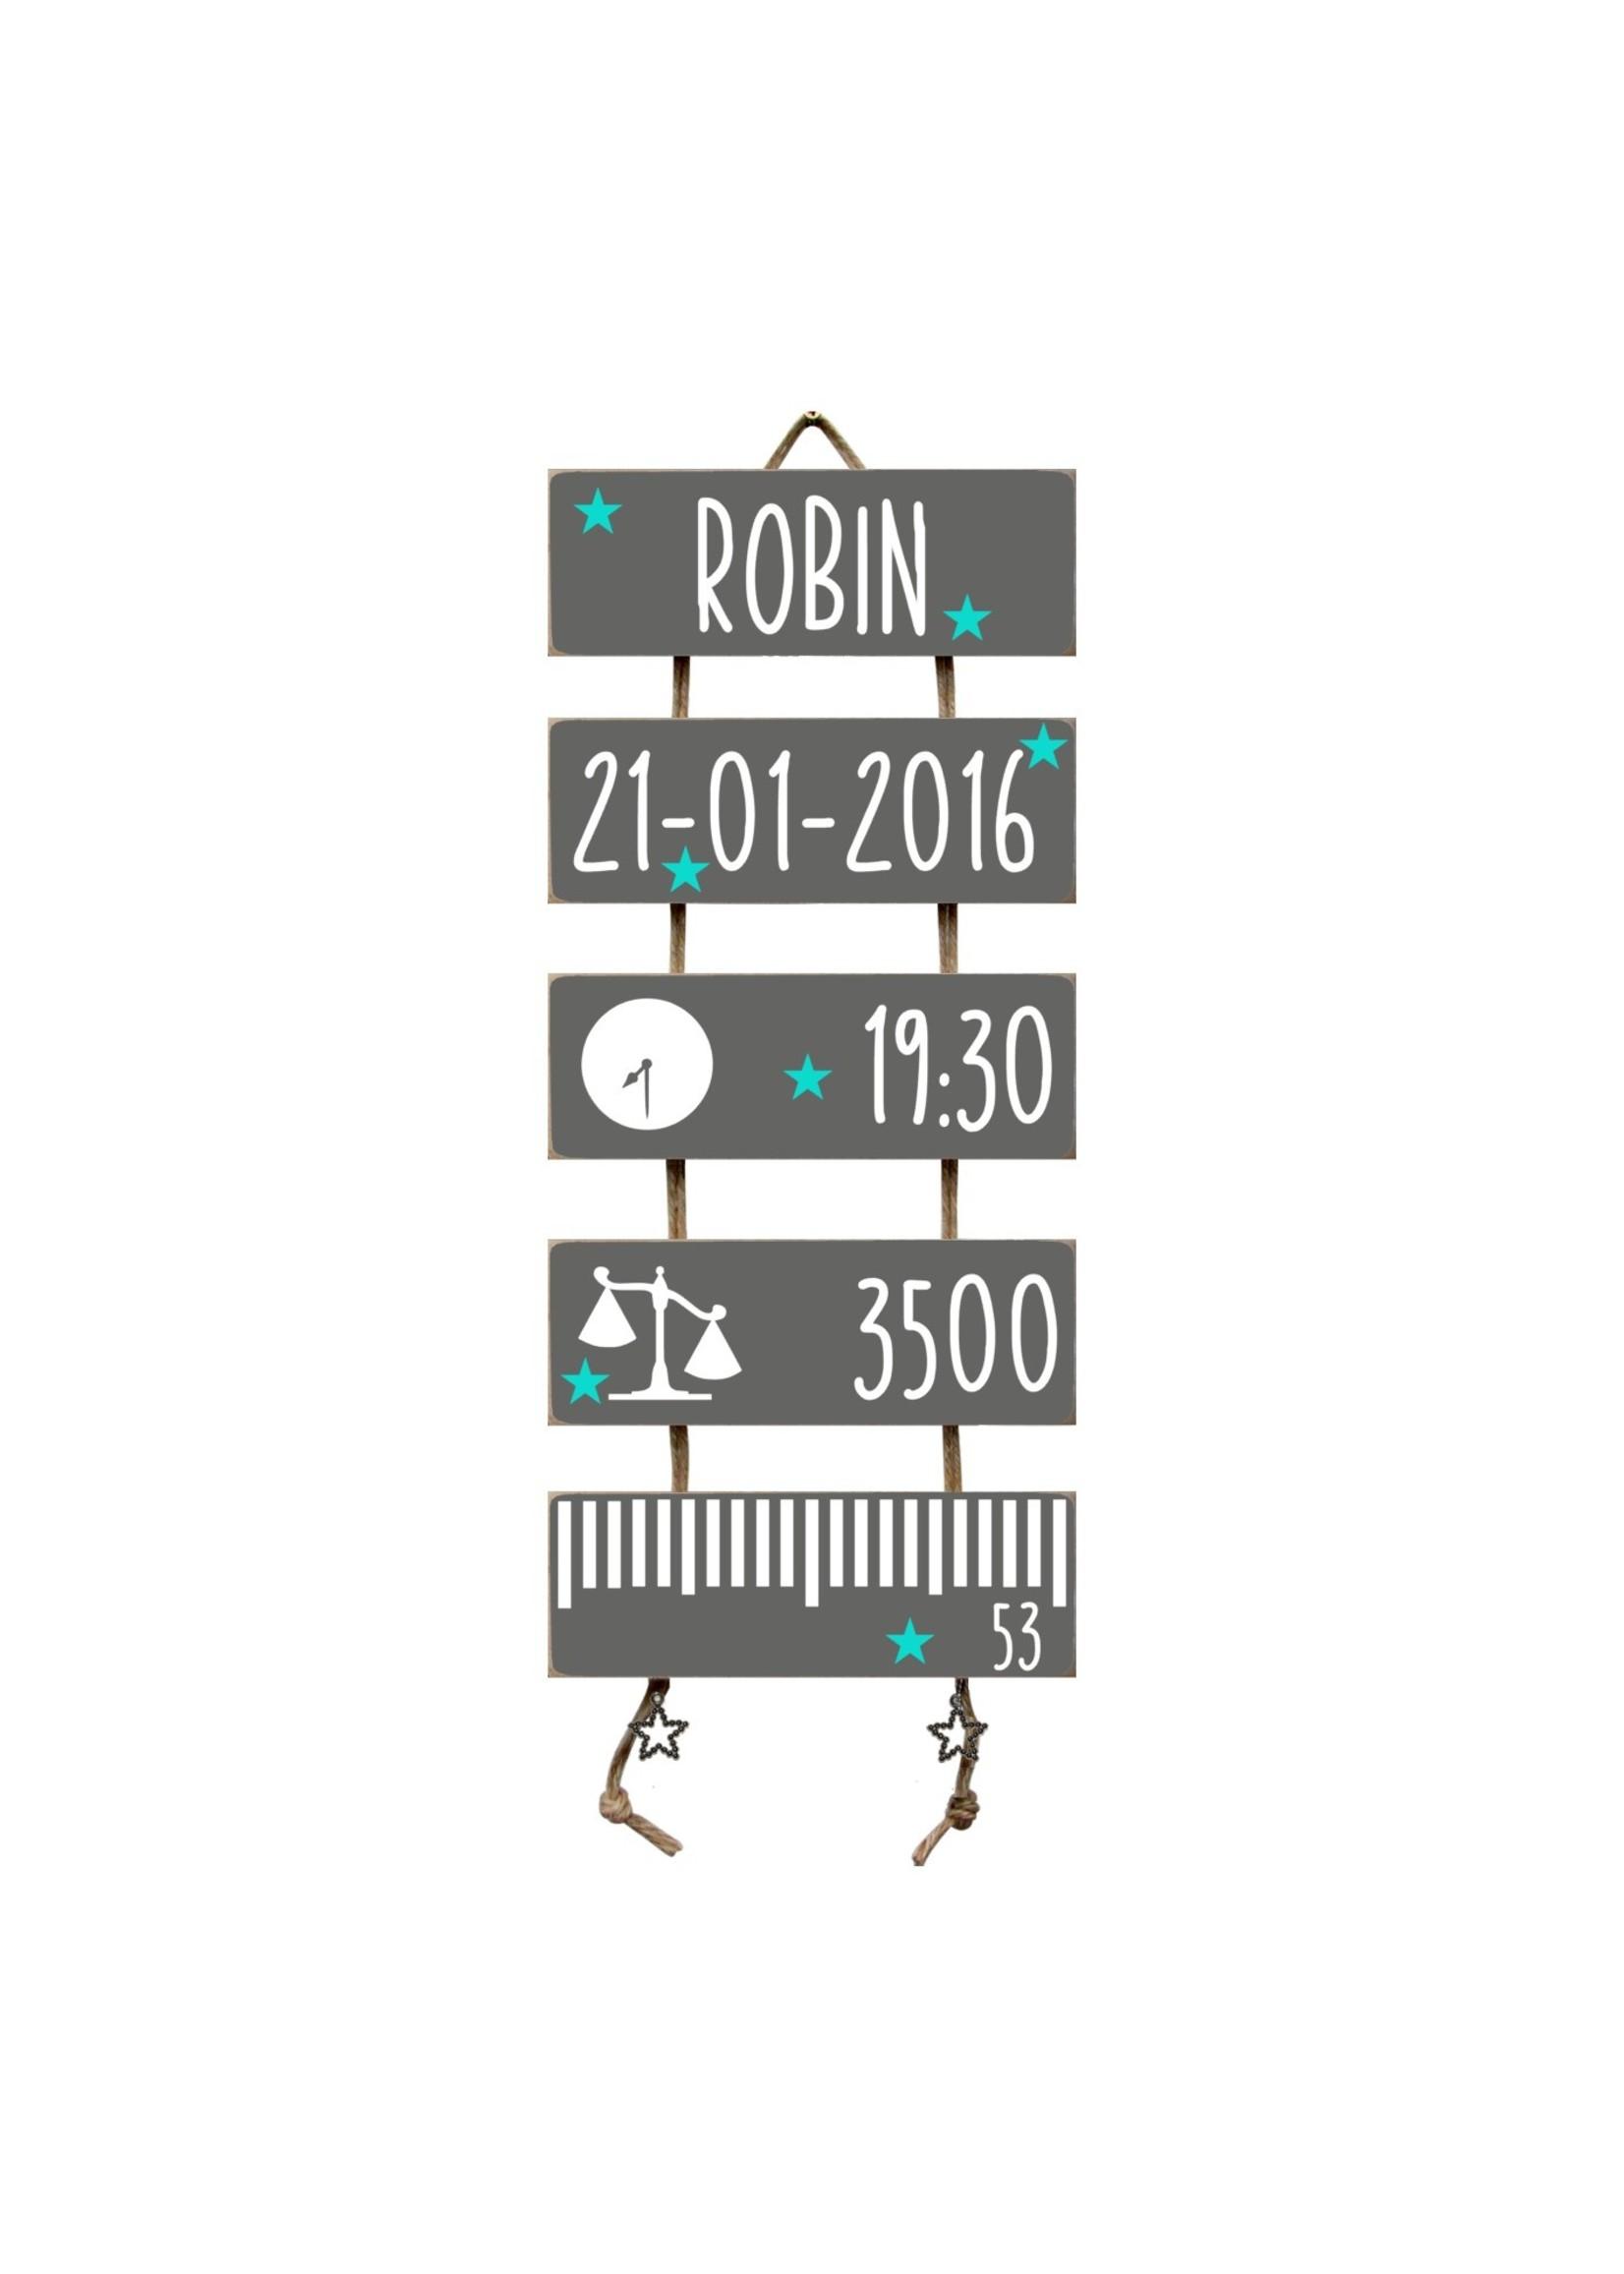 Kraamcadeau Geboorteladder Robin antraciet